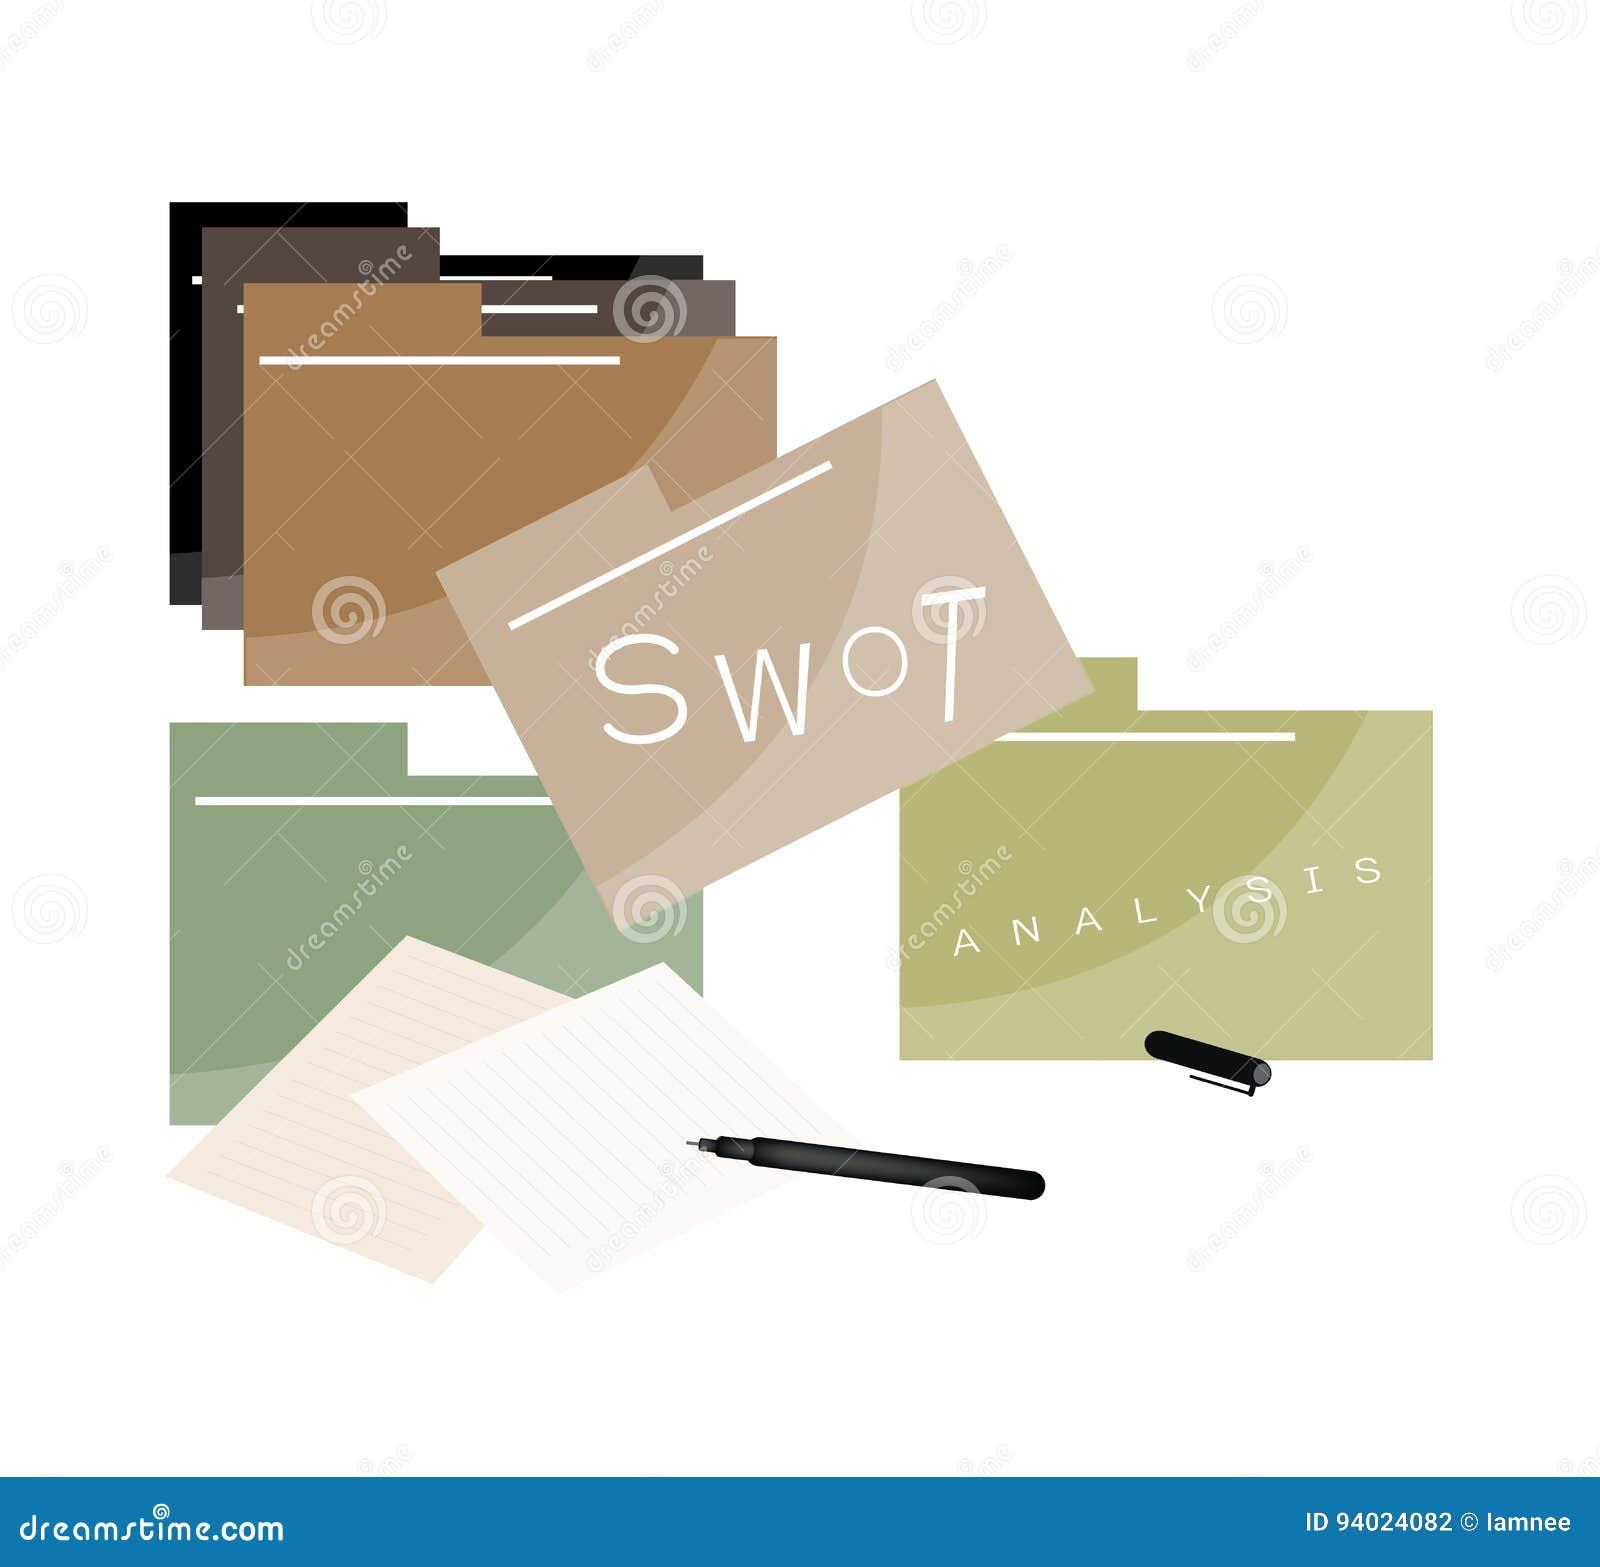 Файл бизнес плана идея свой бизнес прокат